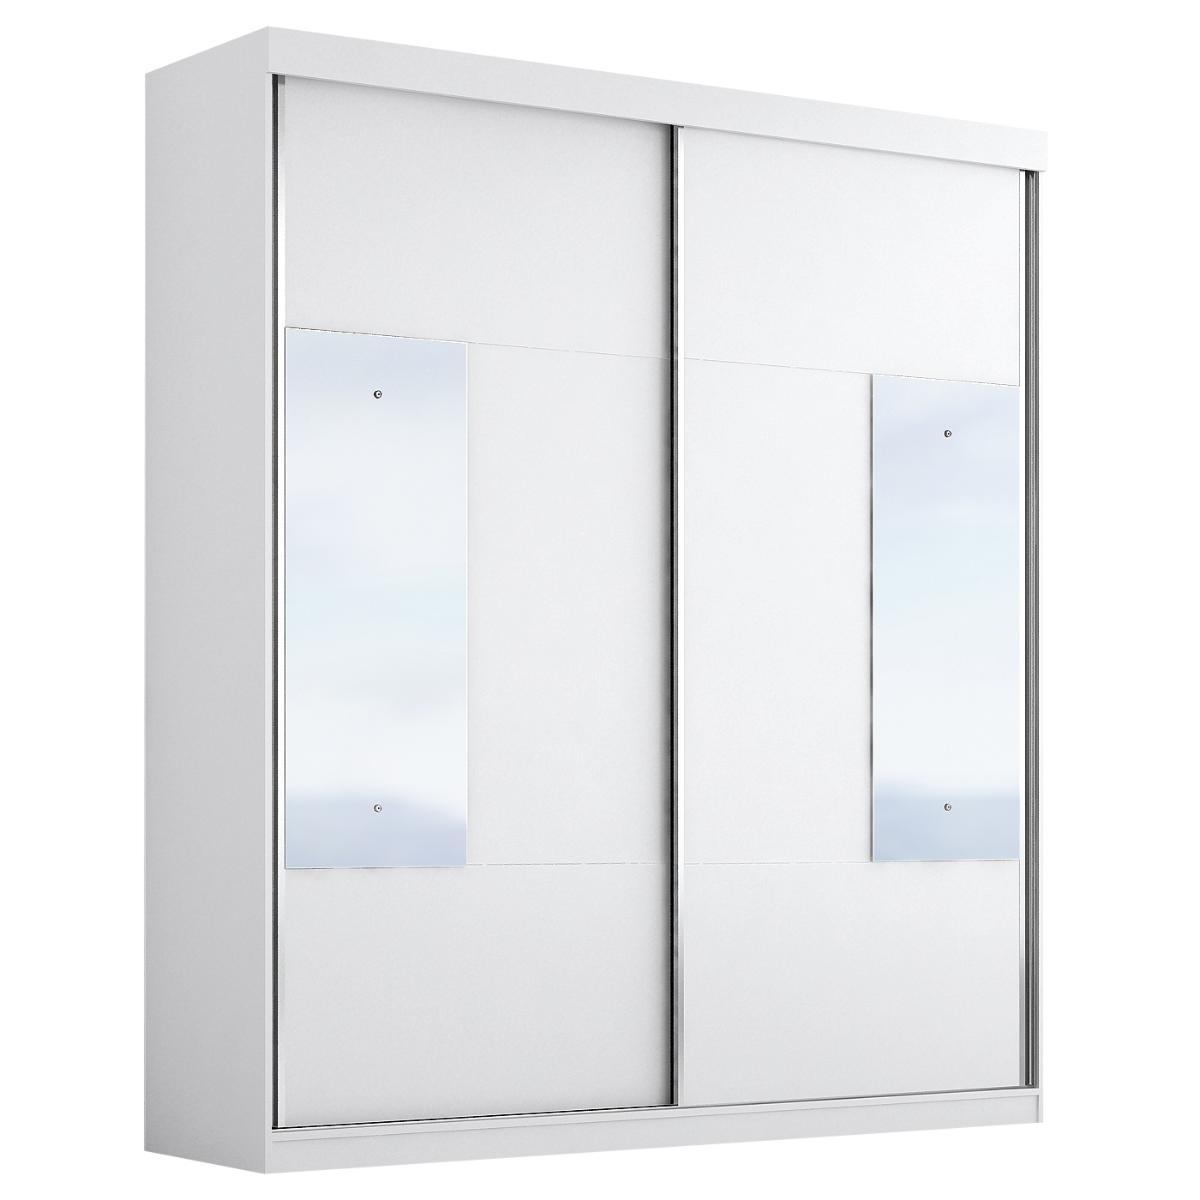 Roupeiro Floripa Plus 2 Portas Slide Com Espelho - Branco - Panan